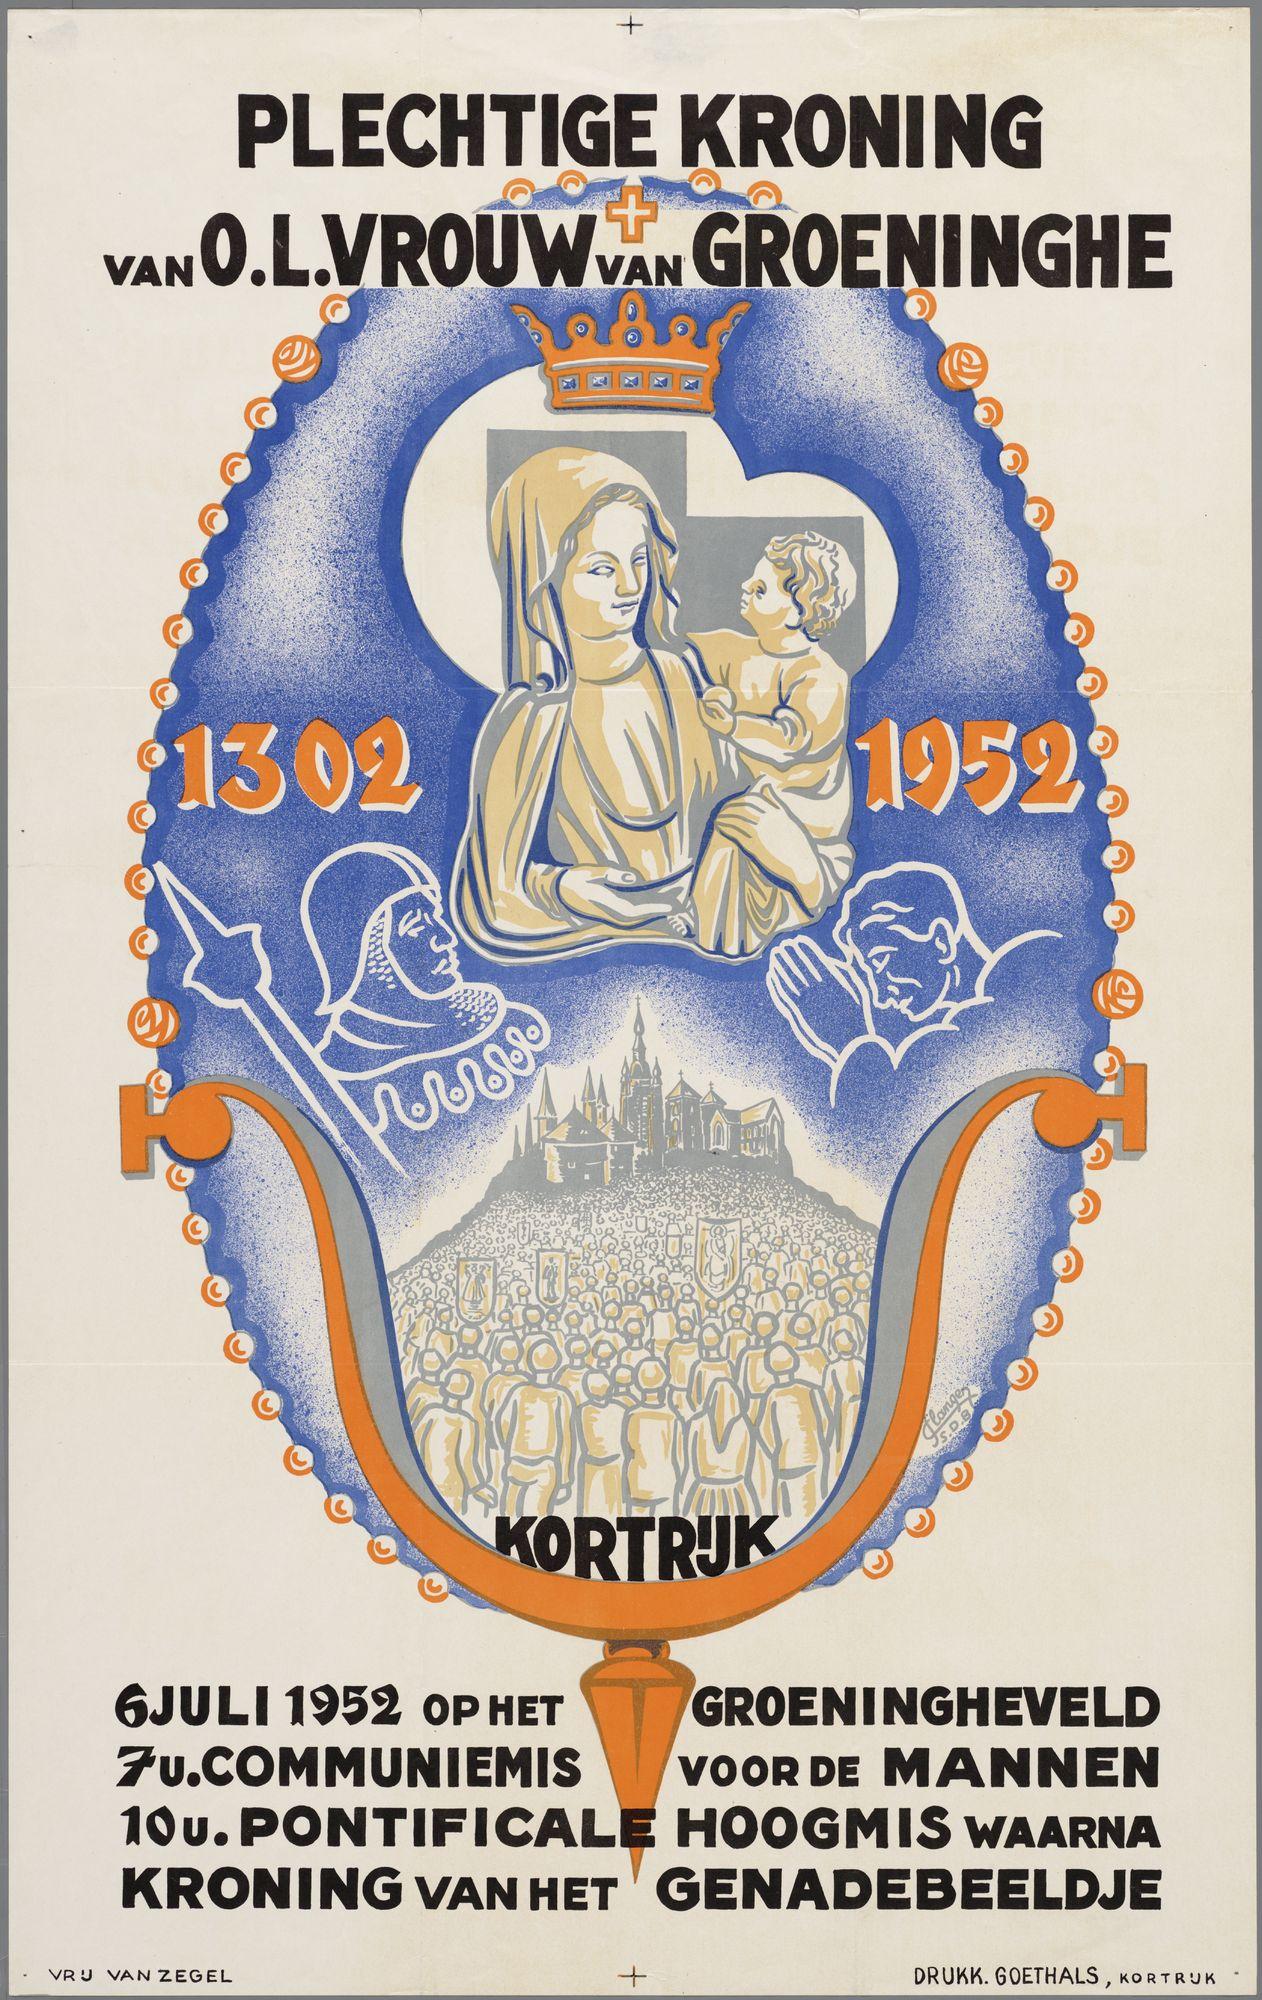 Kroning van O.L.Vrouw van Groeninghe 1302-1952